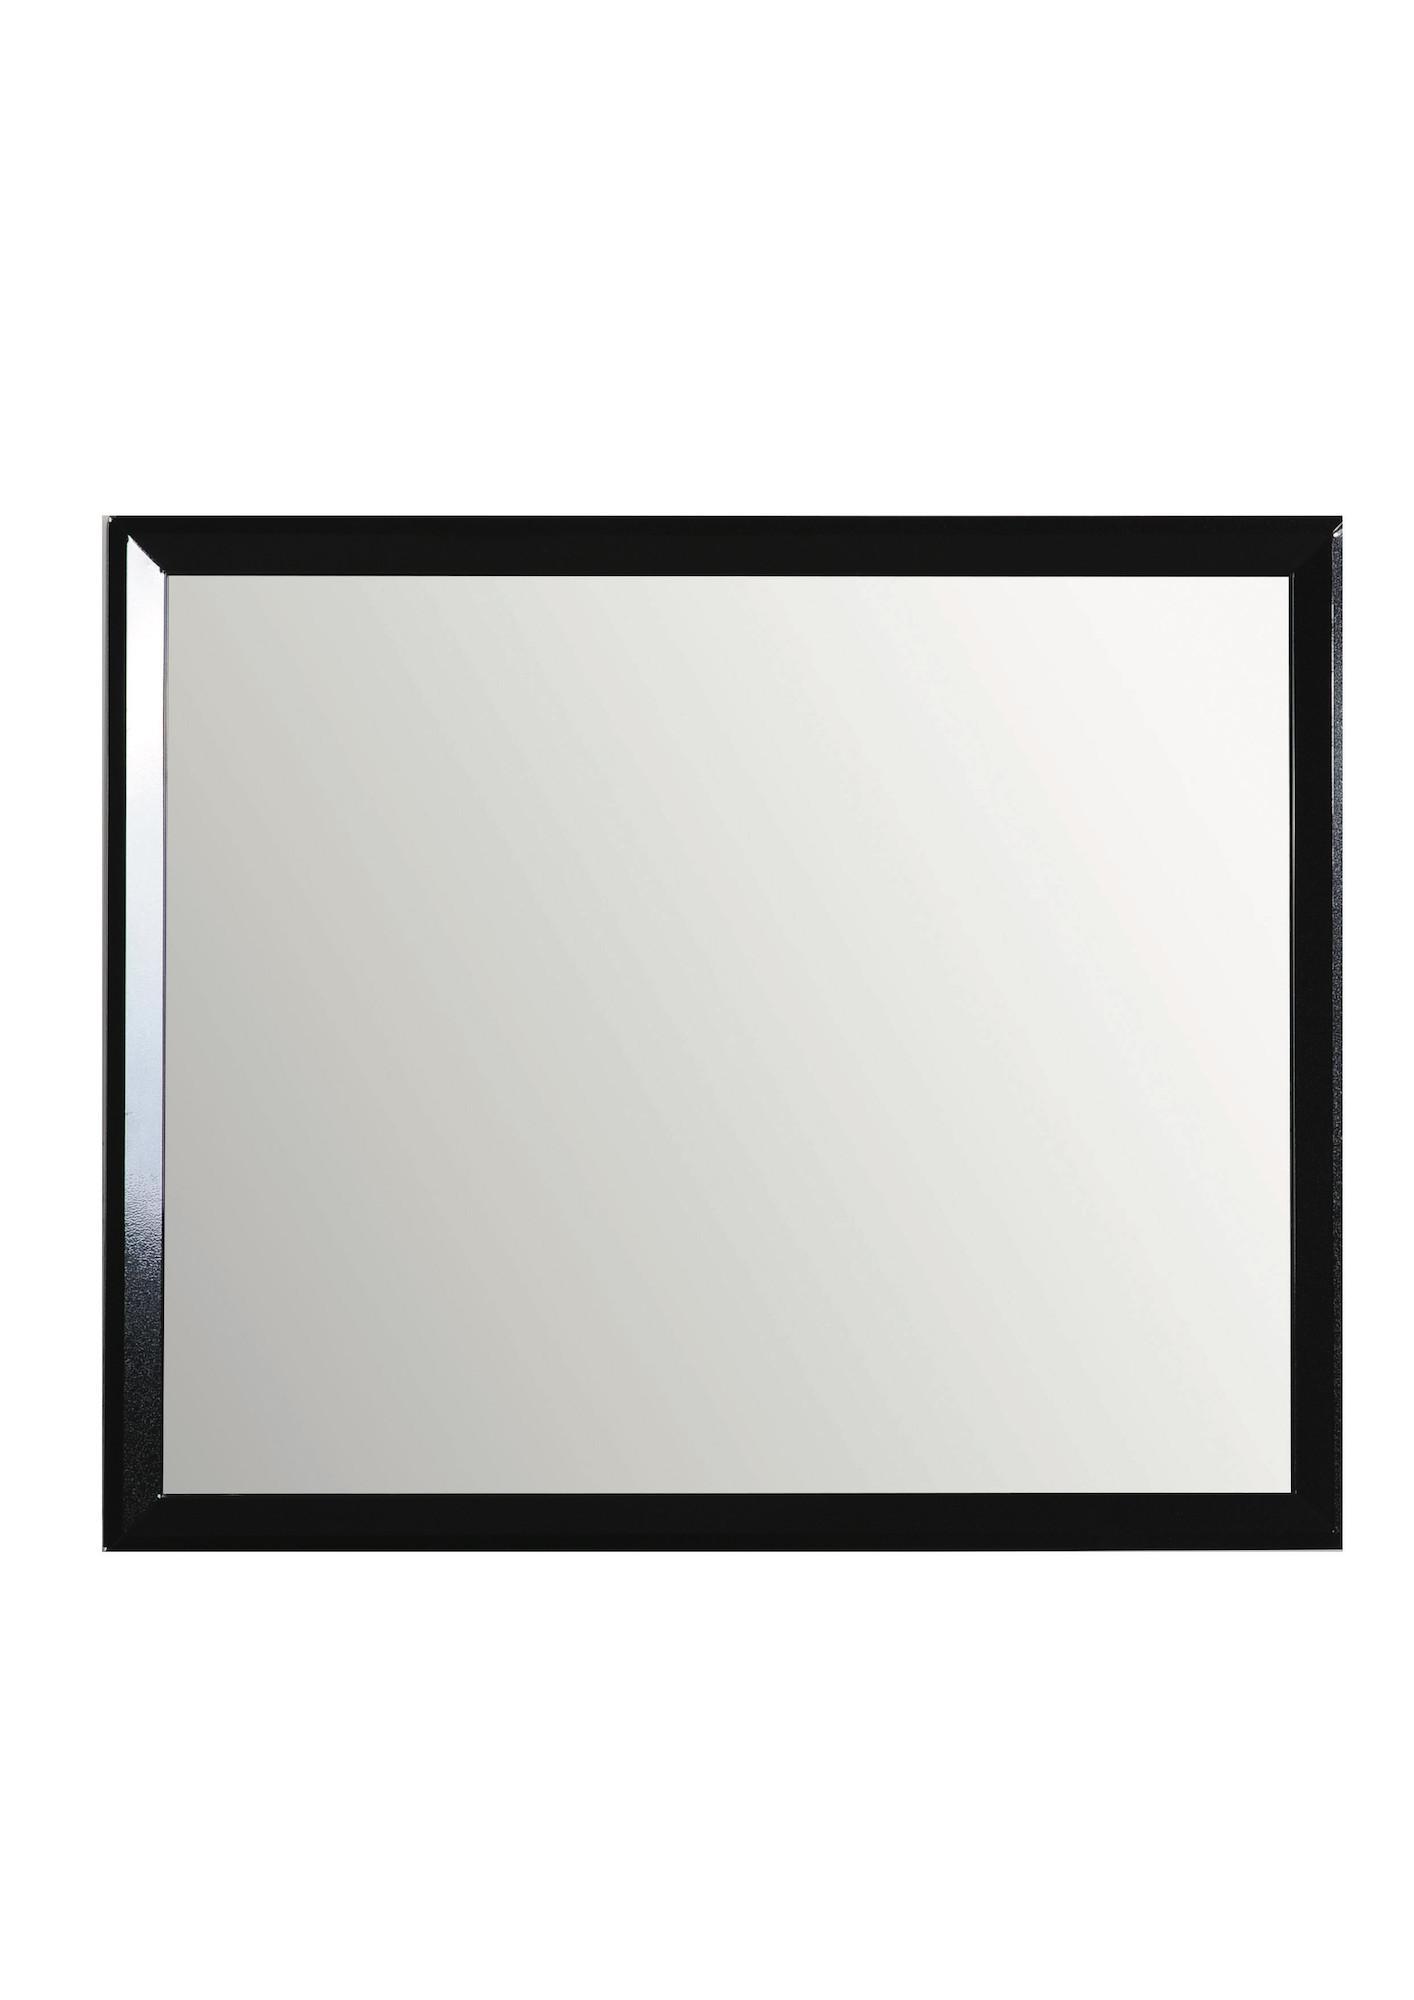 Rubine RBM-56101 Stainless Steel Frame Wall Mirror